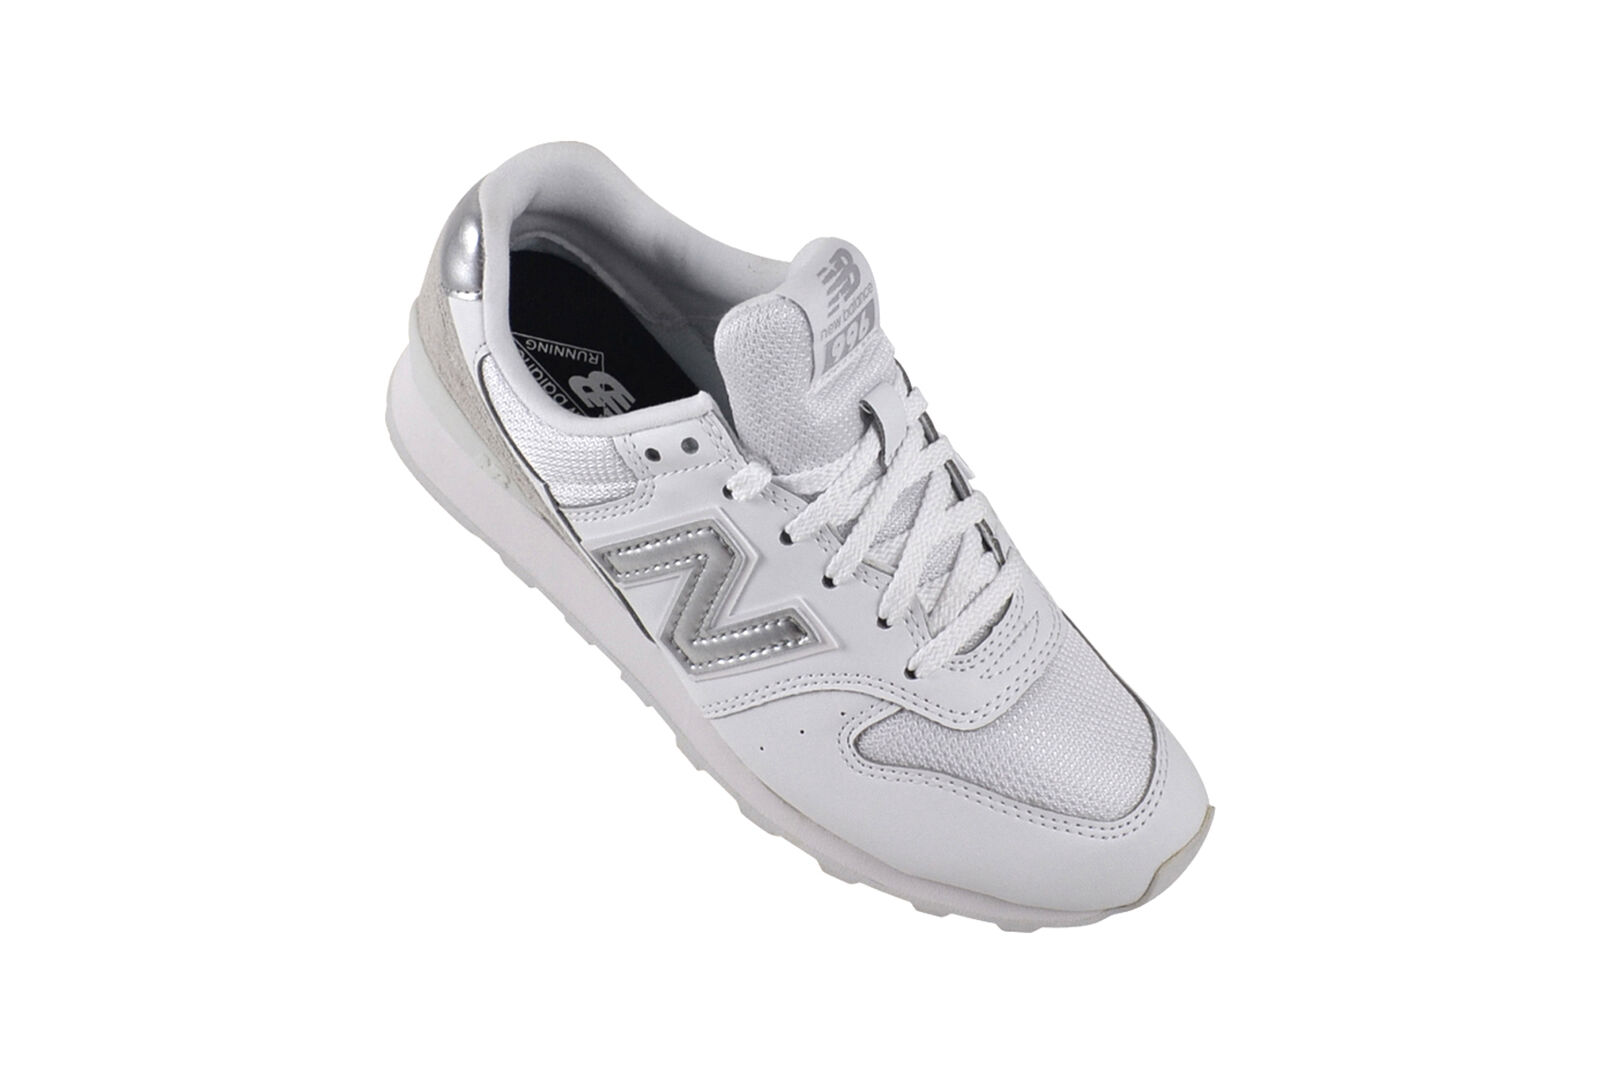 New Balance wr996 WM blanc Chaussures baskets Blanc